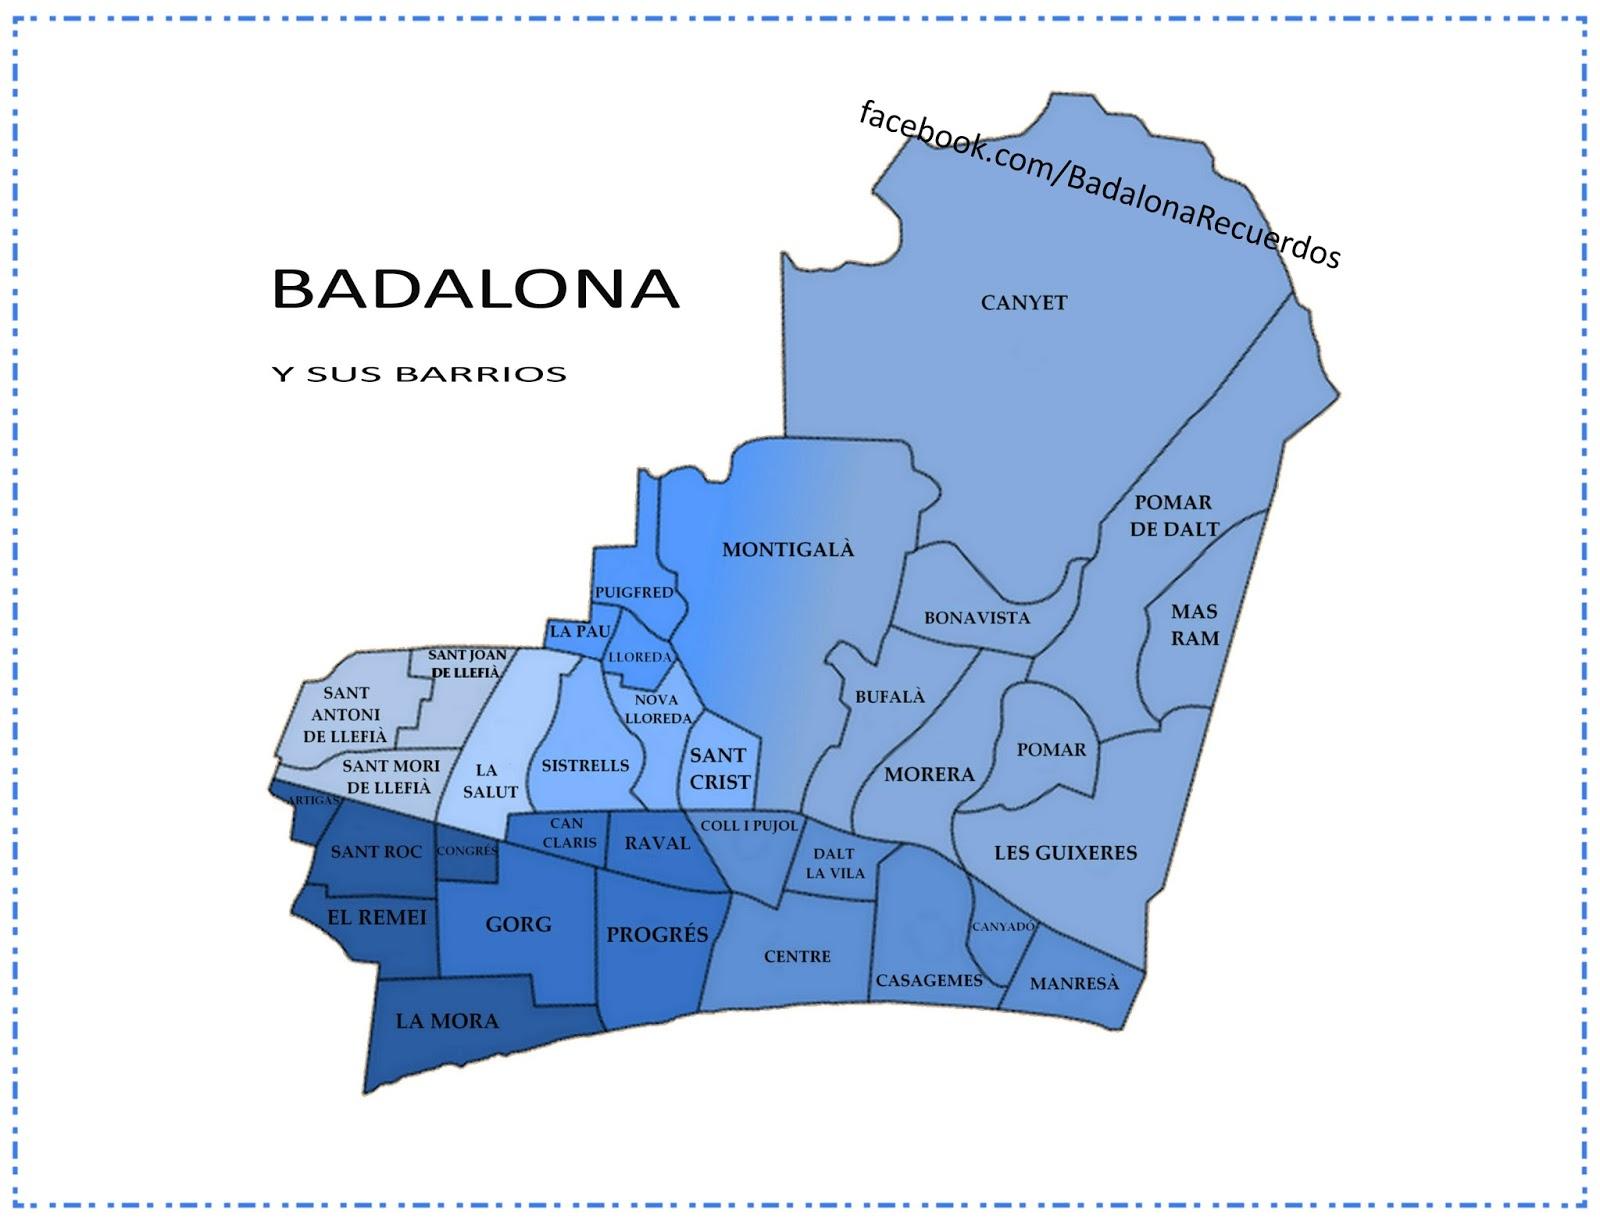 Badalona Recuerdos 2016